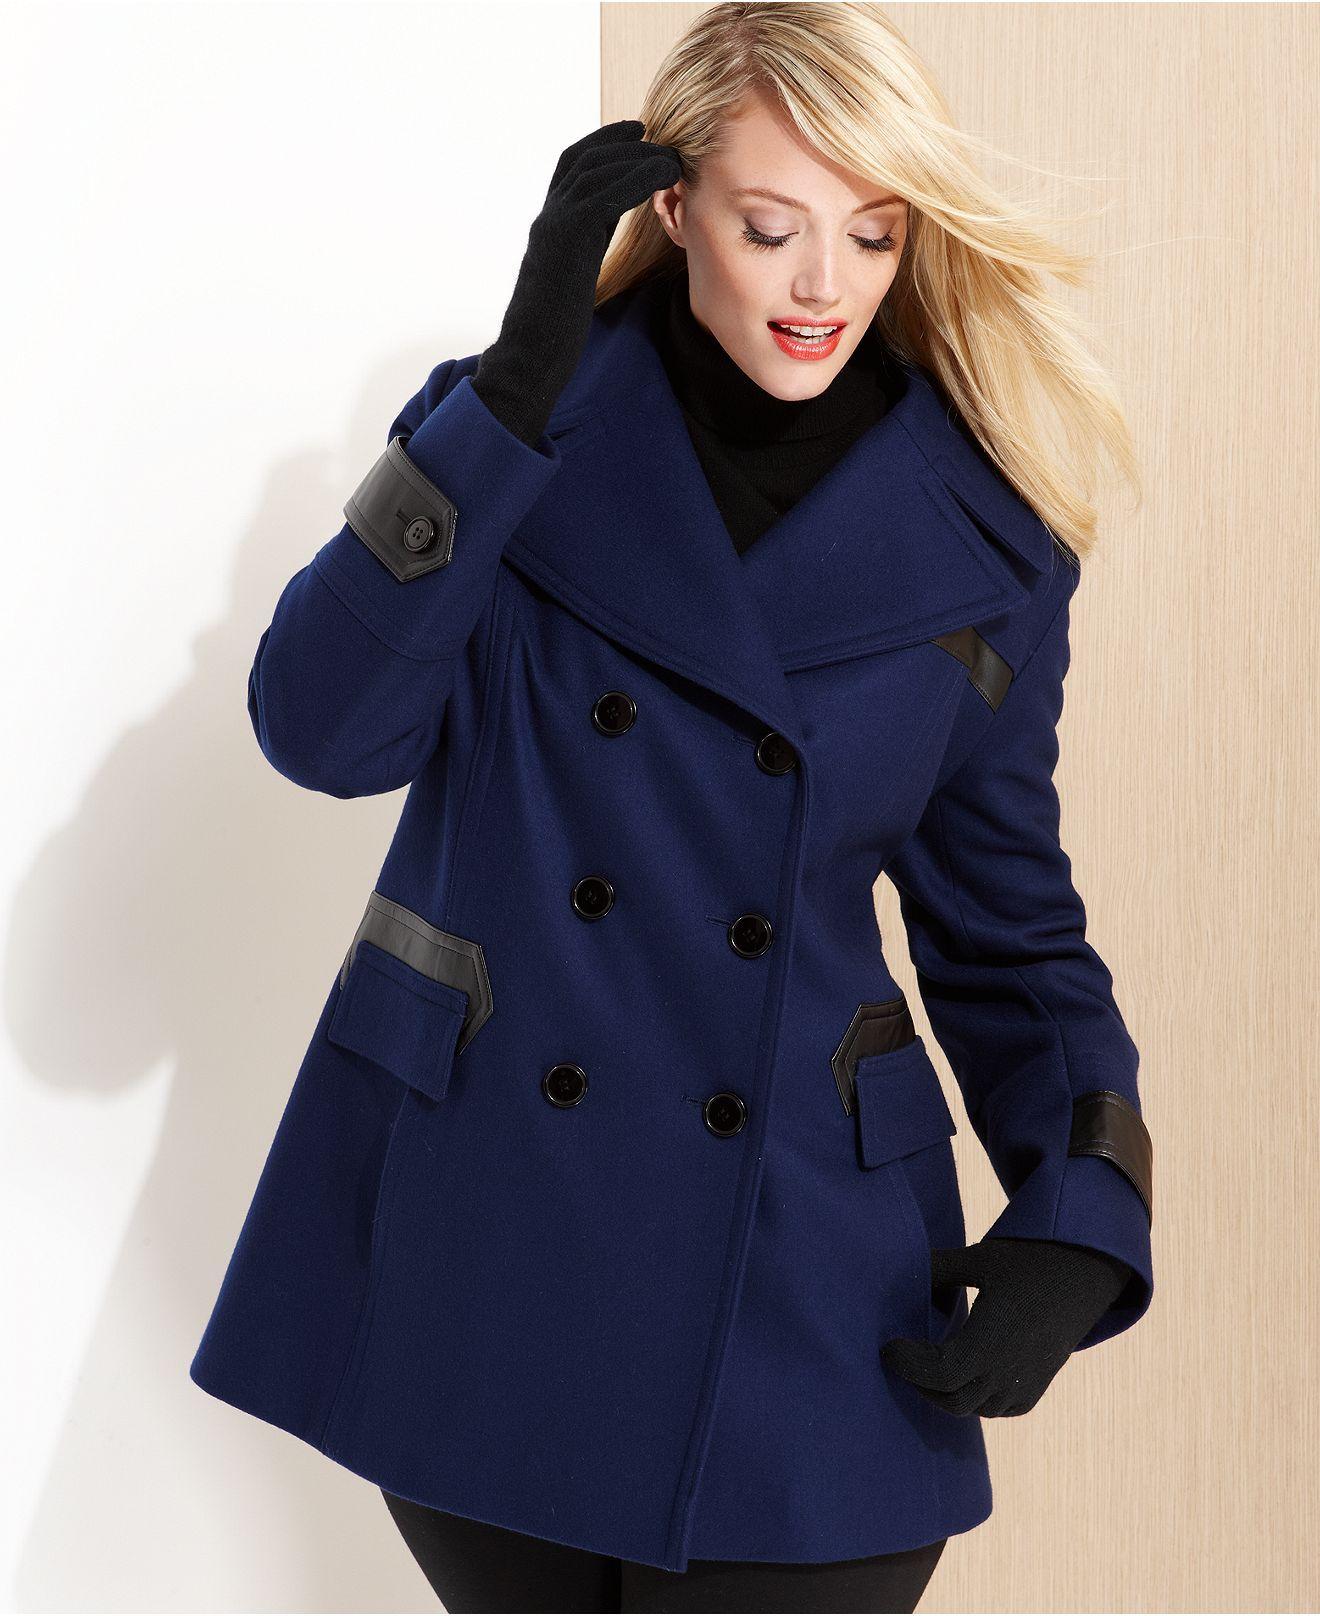 c5b5f7d39e805 Via Spiga Plus Size Coat